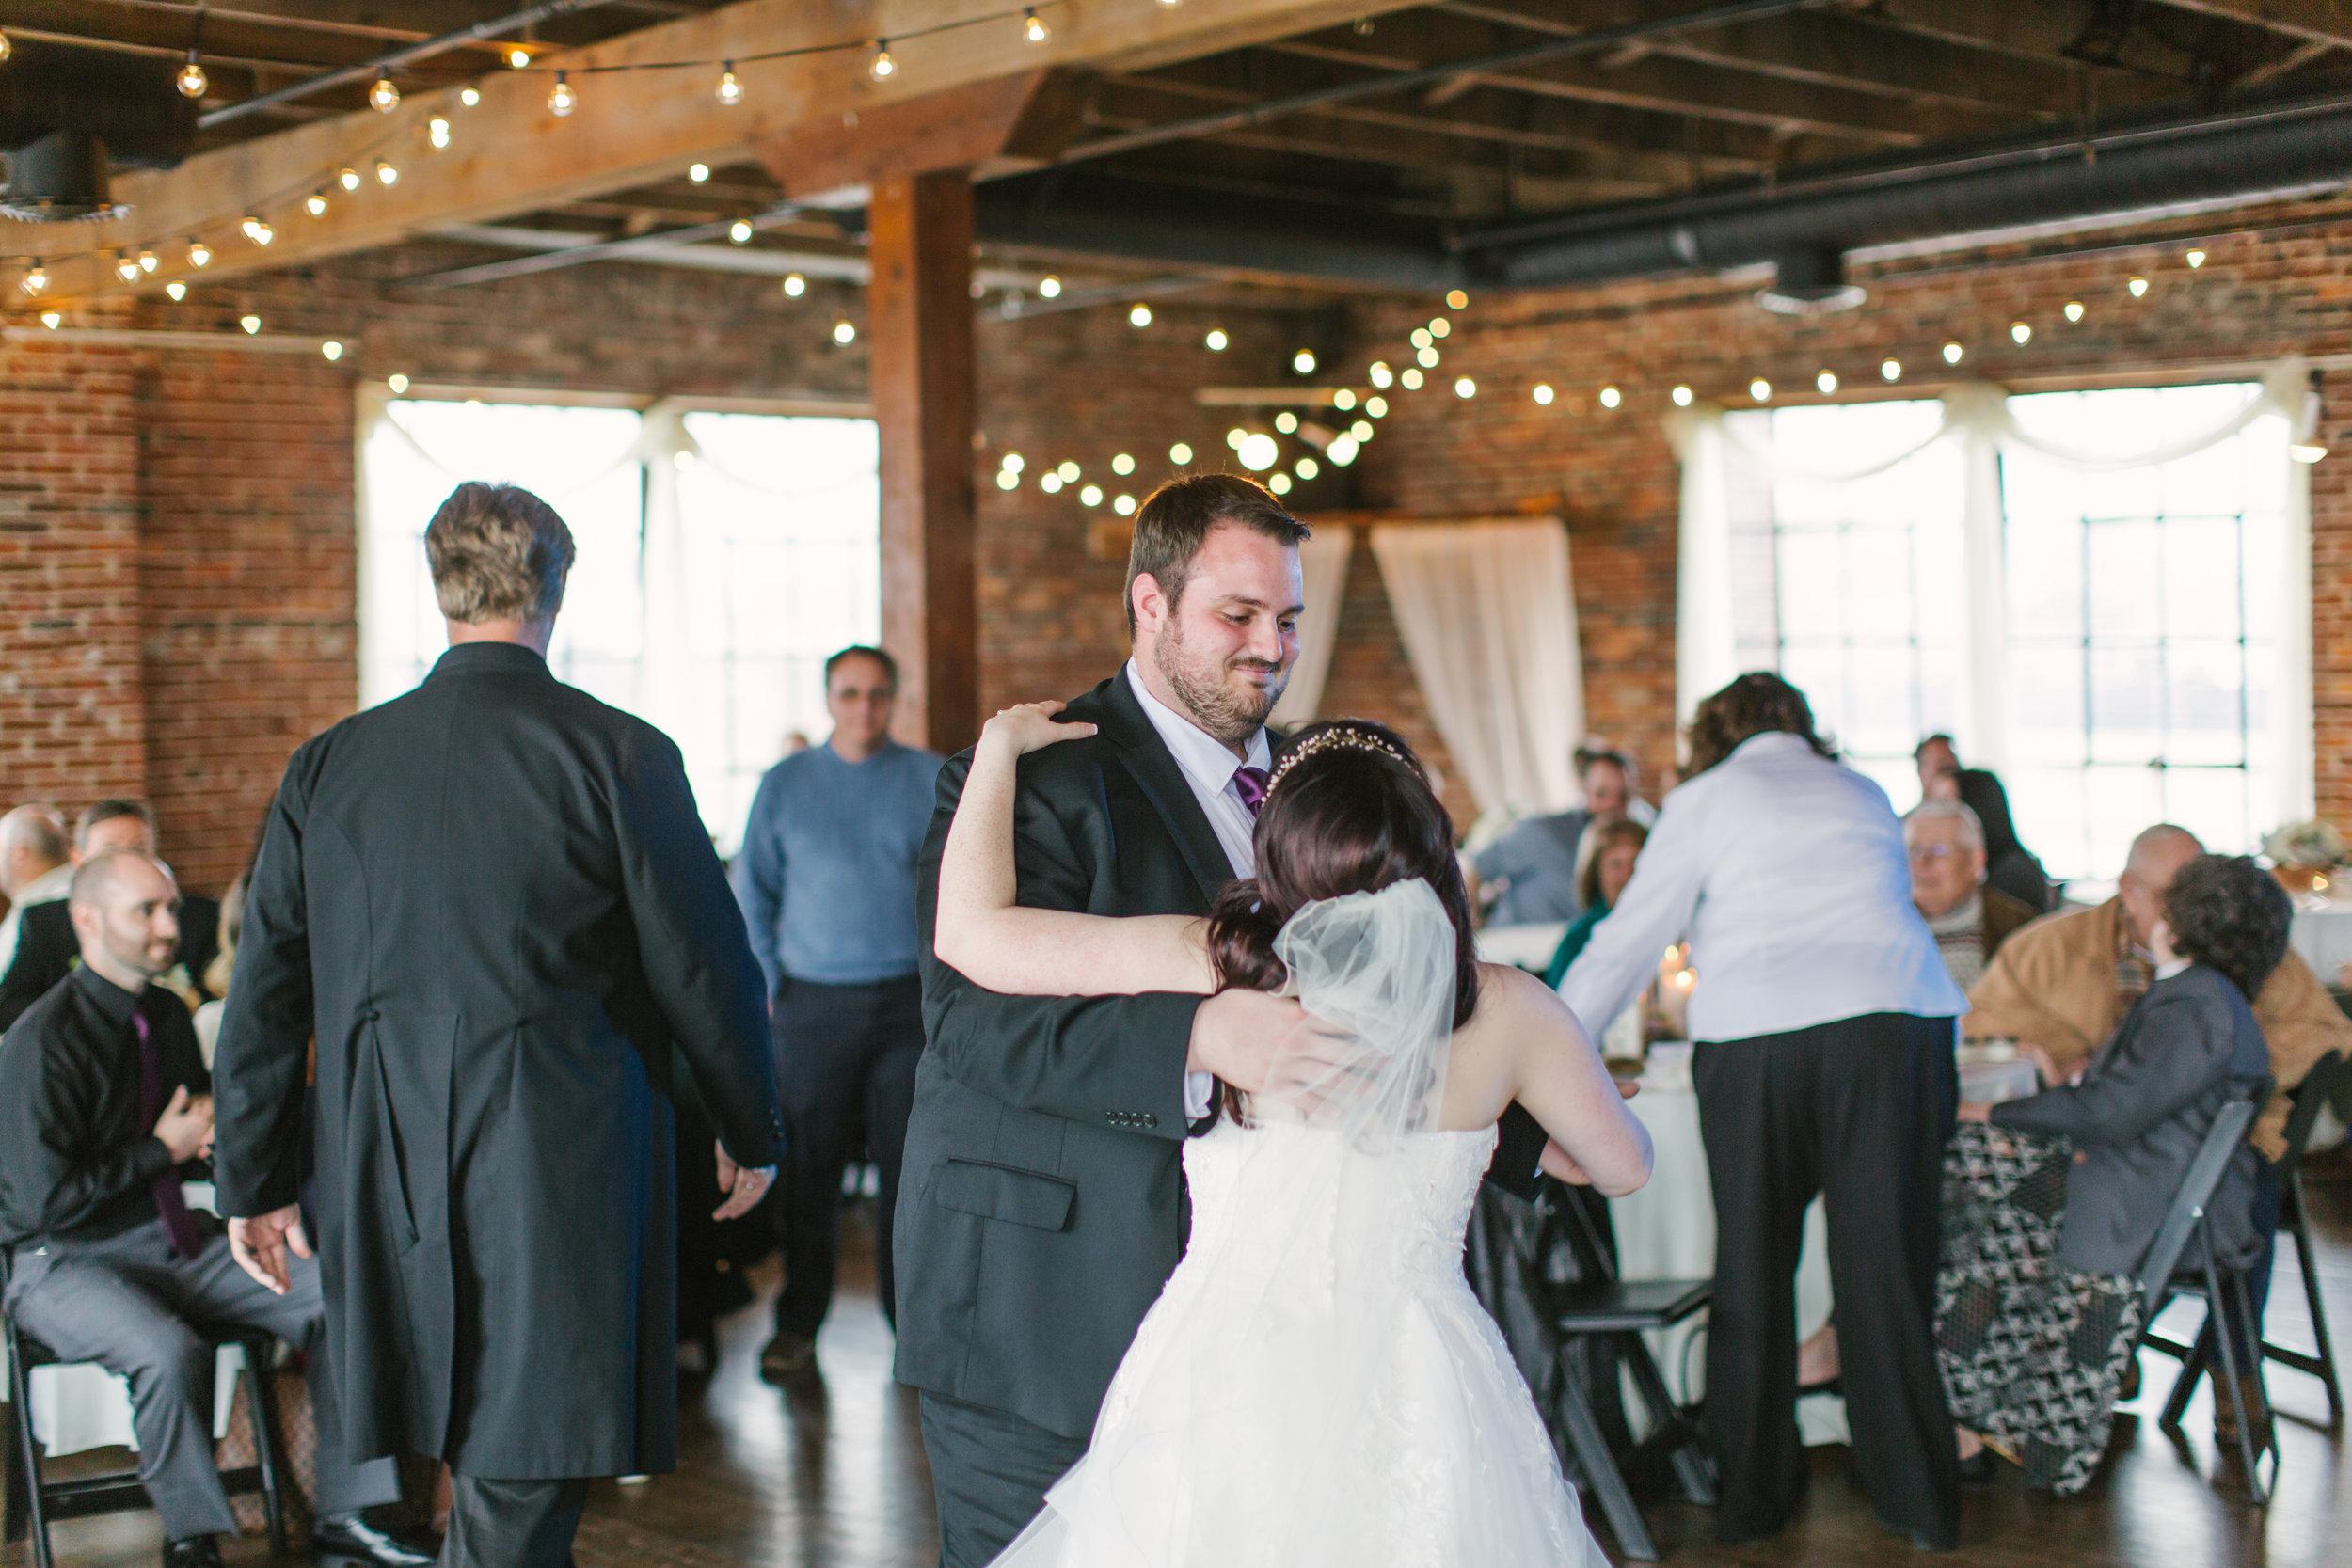 871_Colin+Jessica_Wedding.jpg